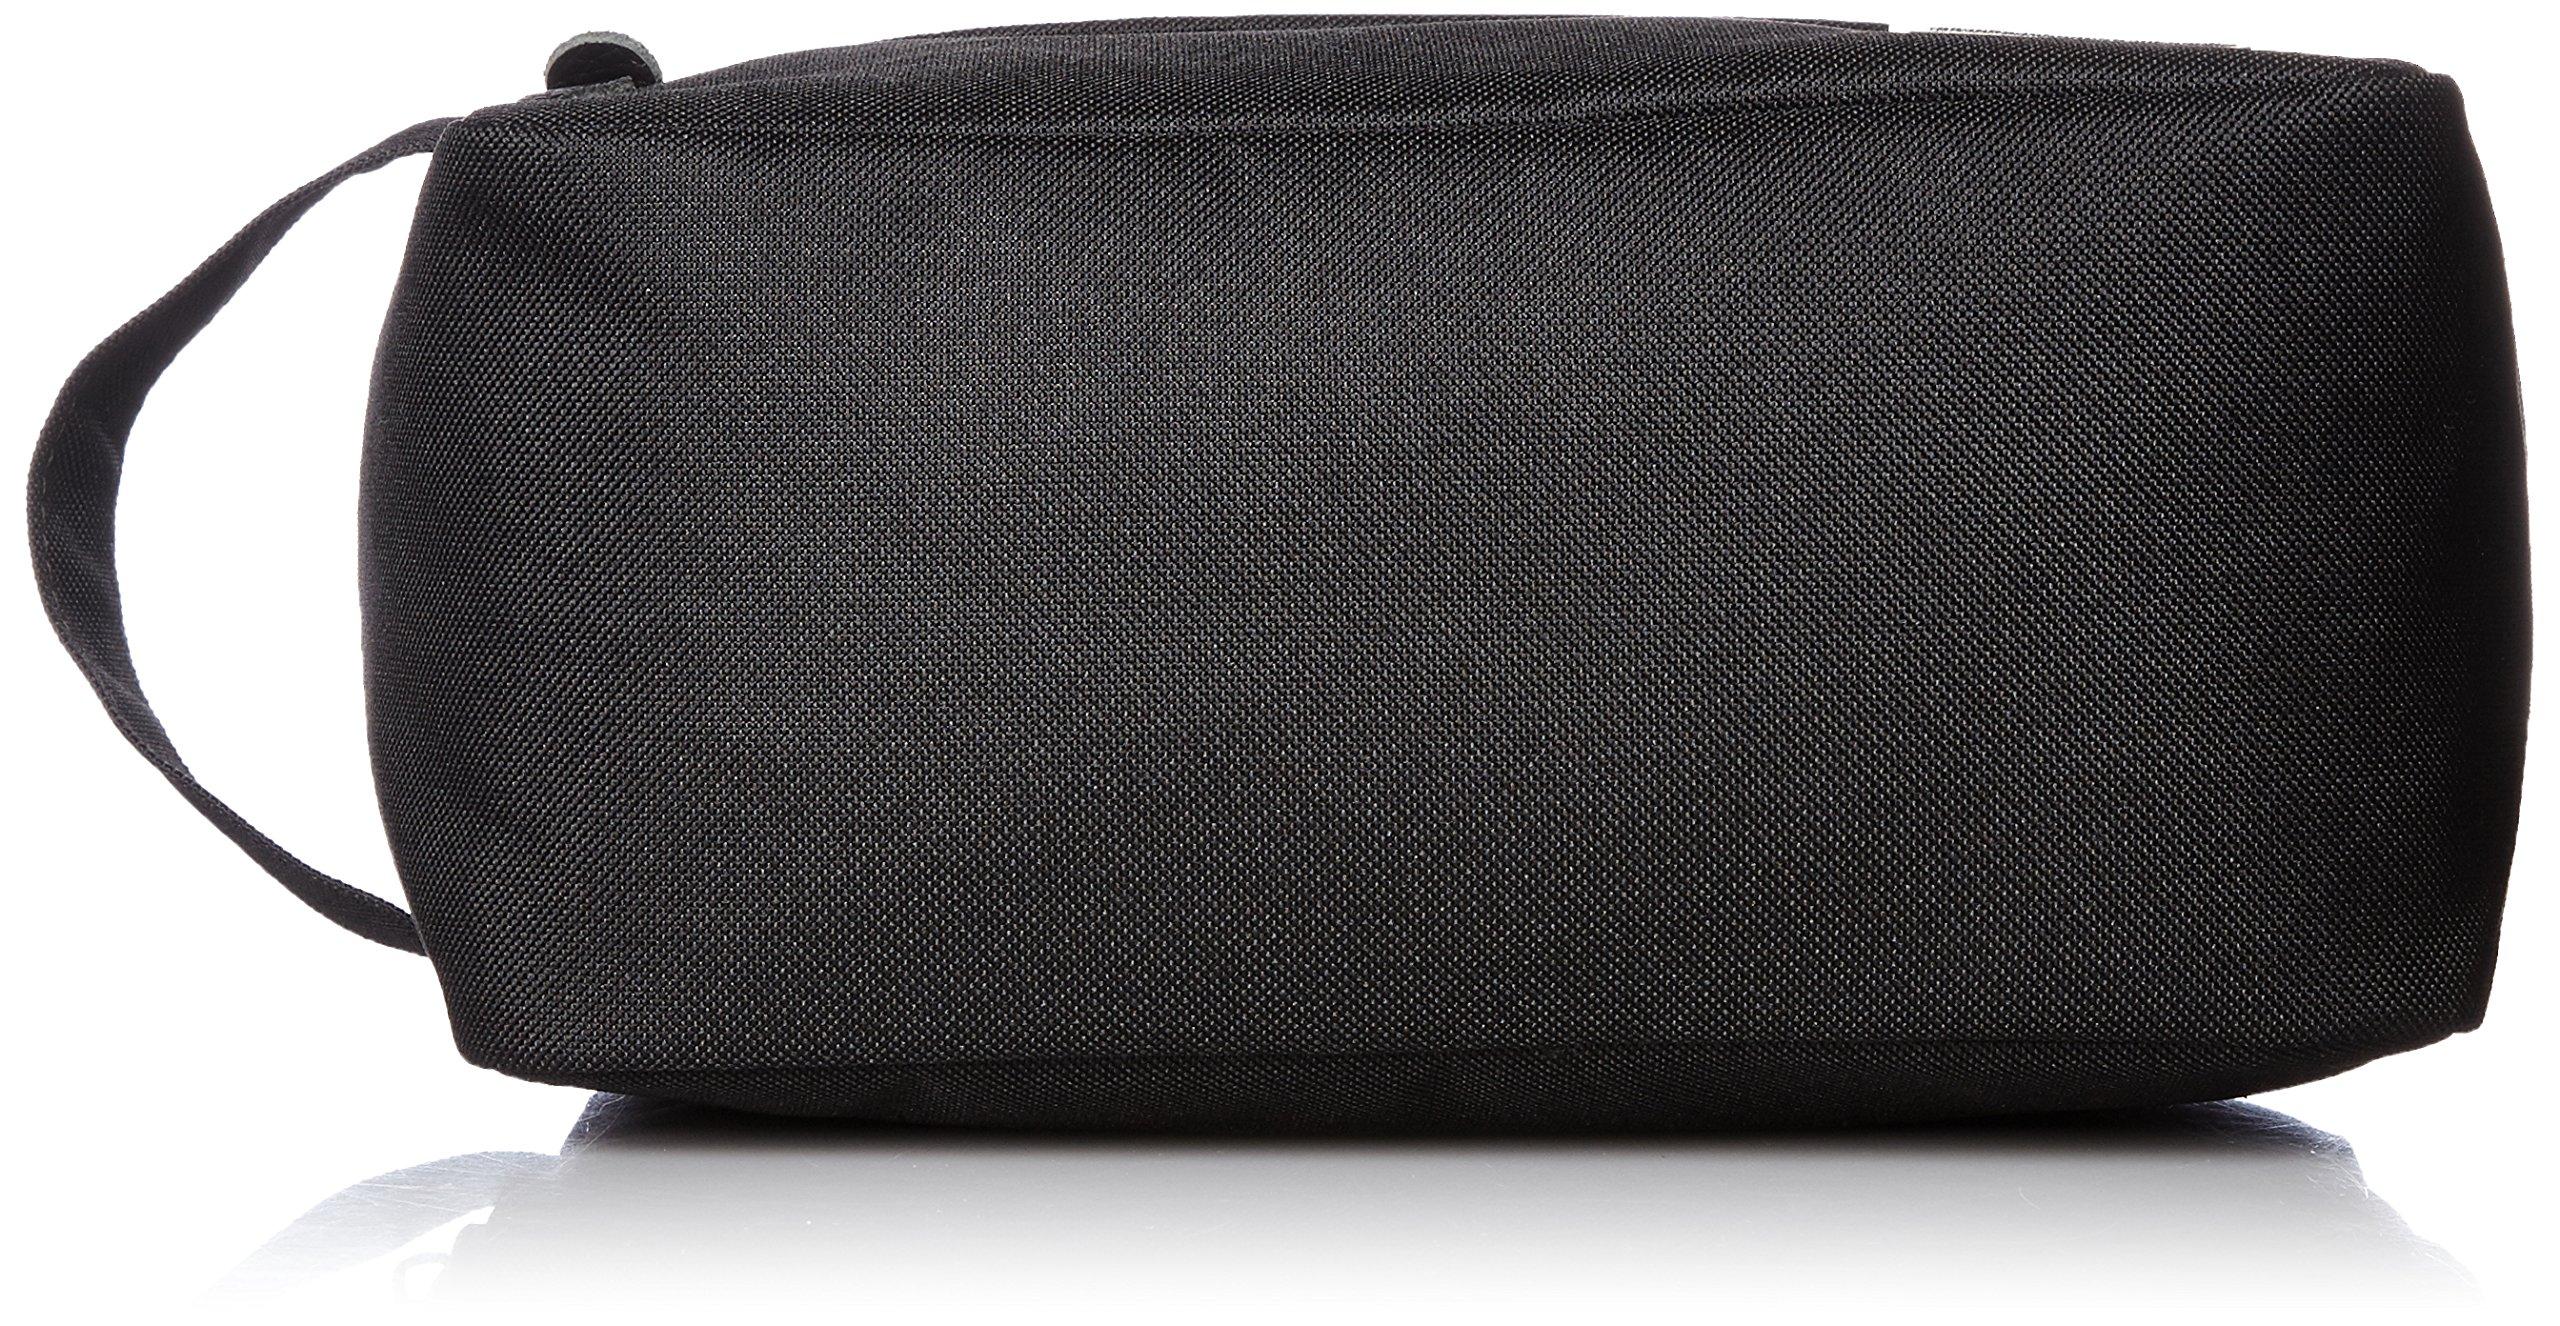 Herschel Supply Co. Chapter Travel Kit,Black,One Size by Herschel Supply Co. (Image #7)